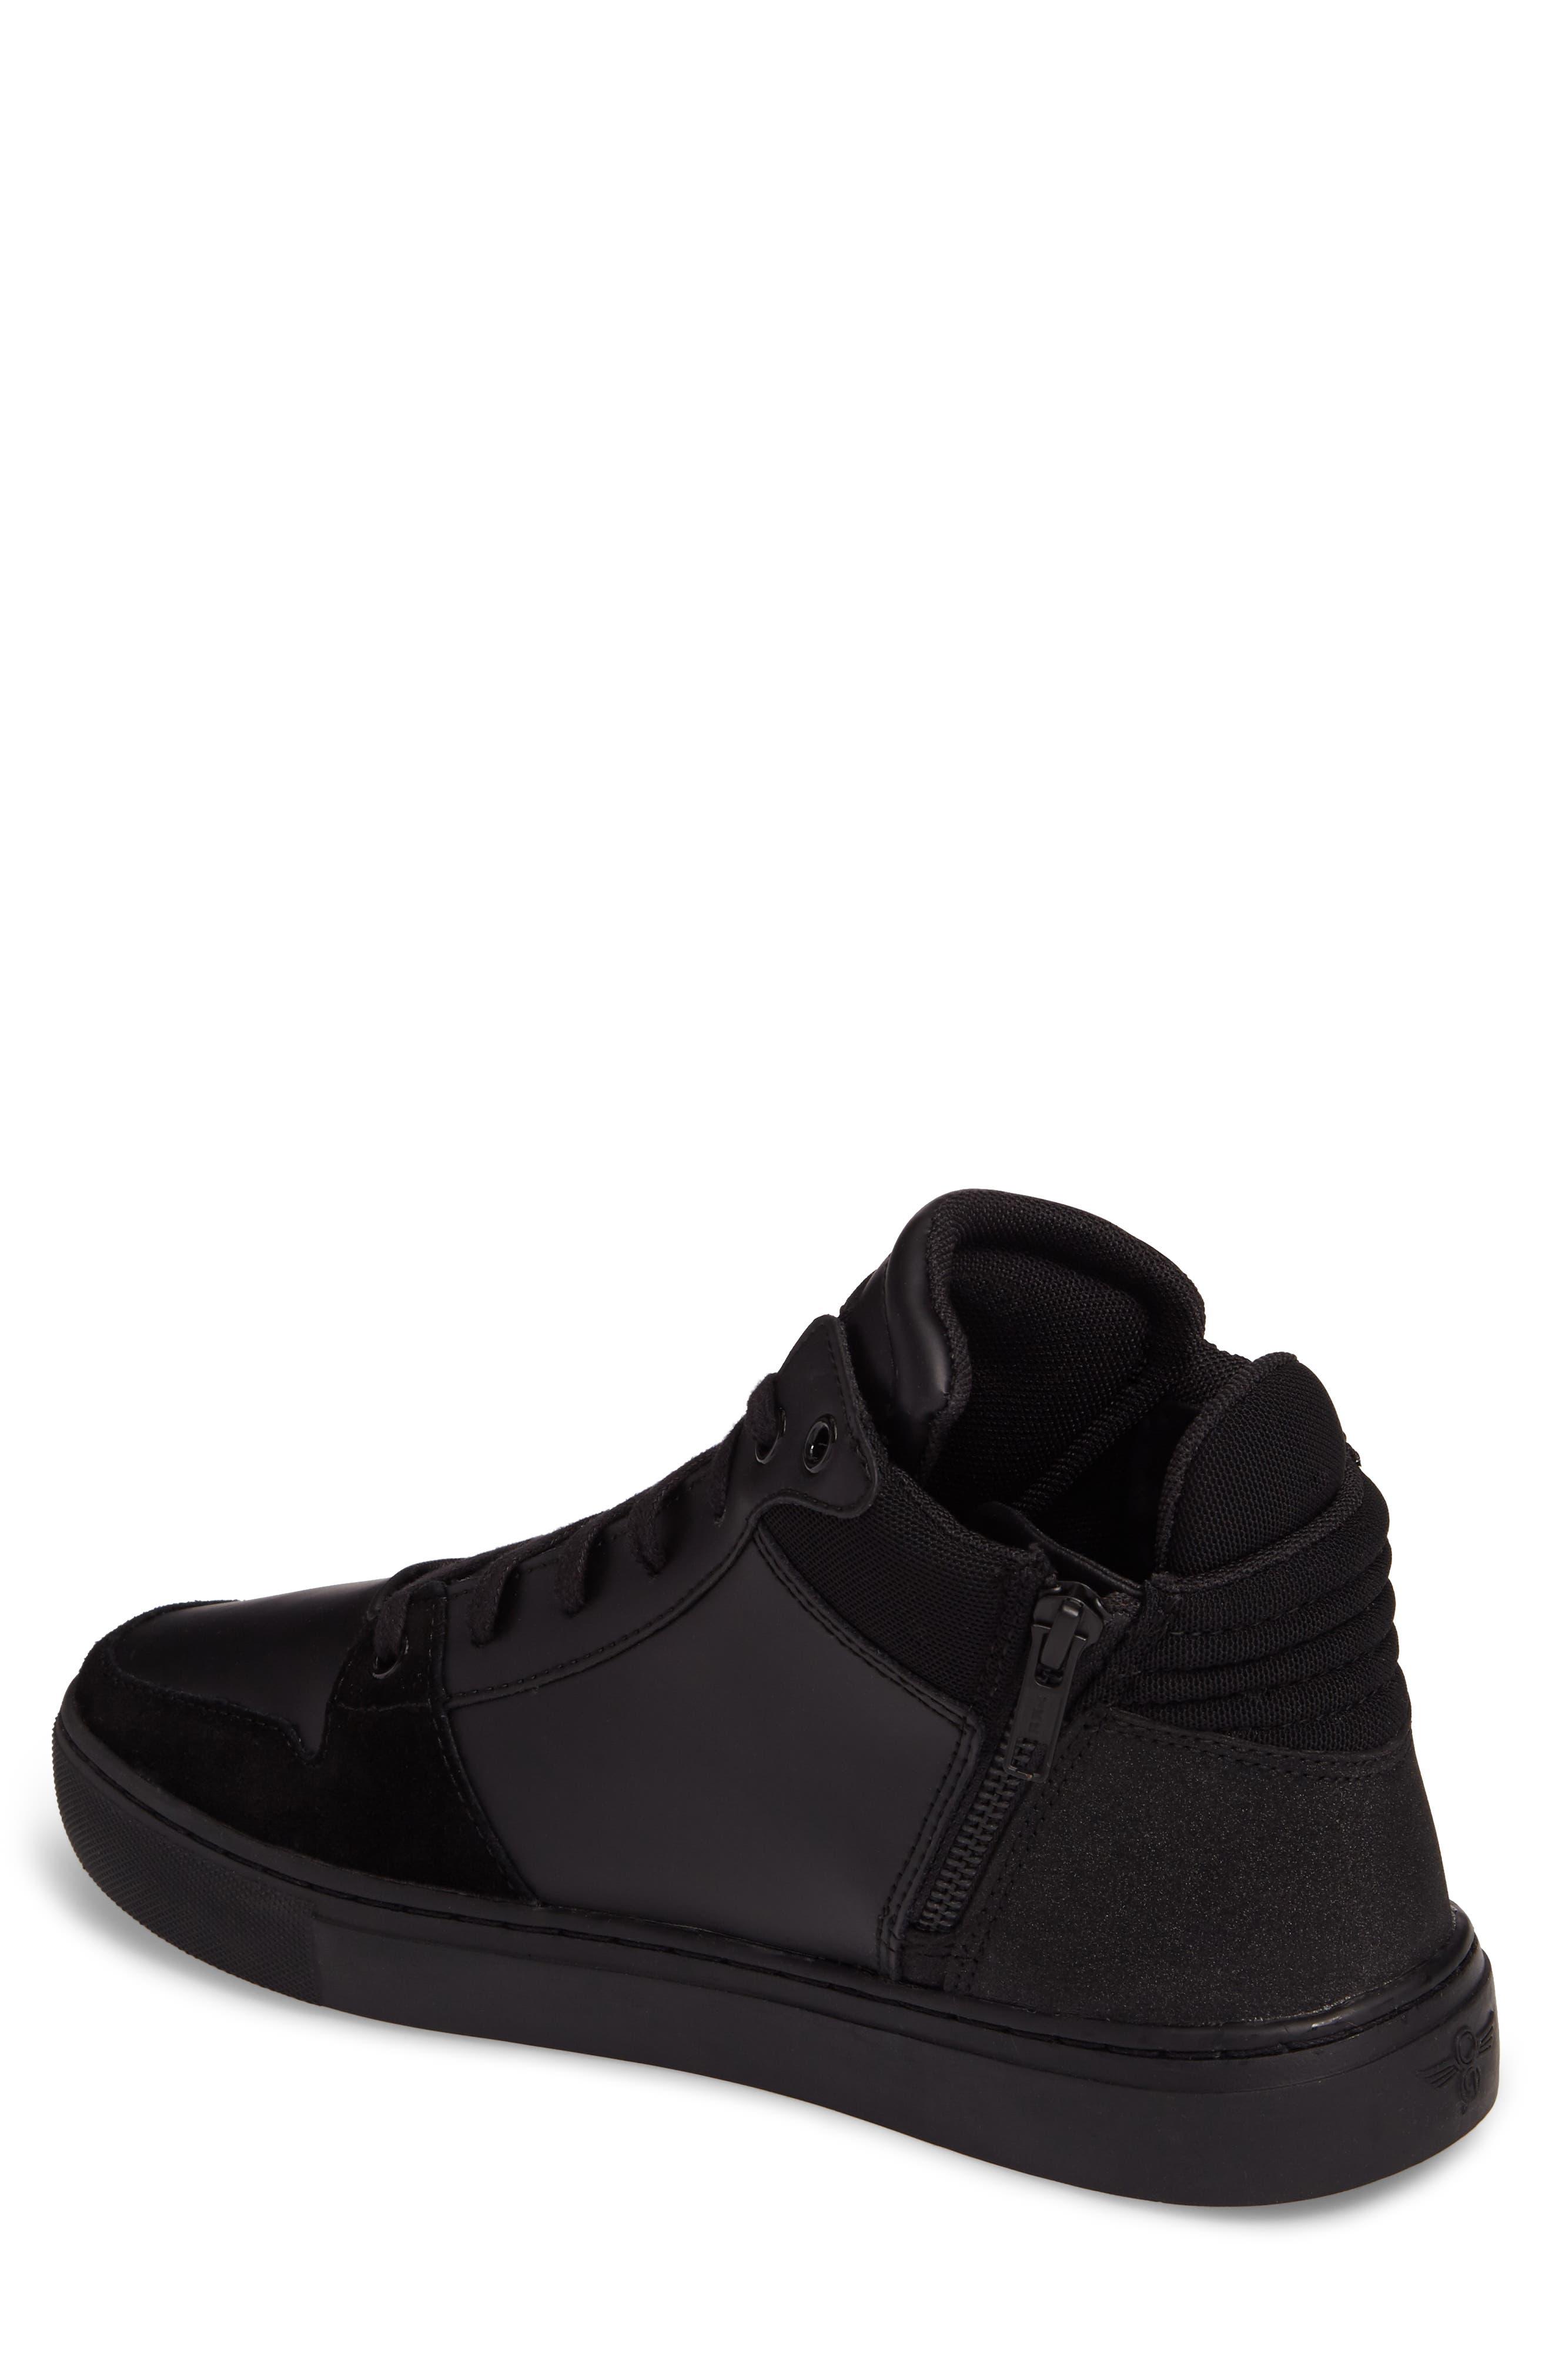 Modena Sneaker,                             Alternate thumbnail 2, color,